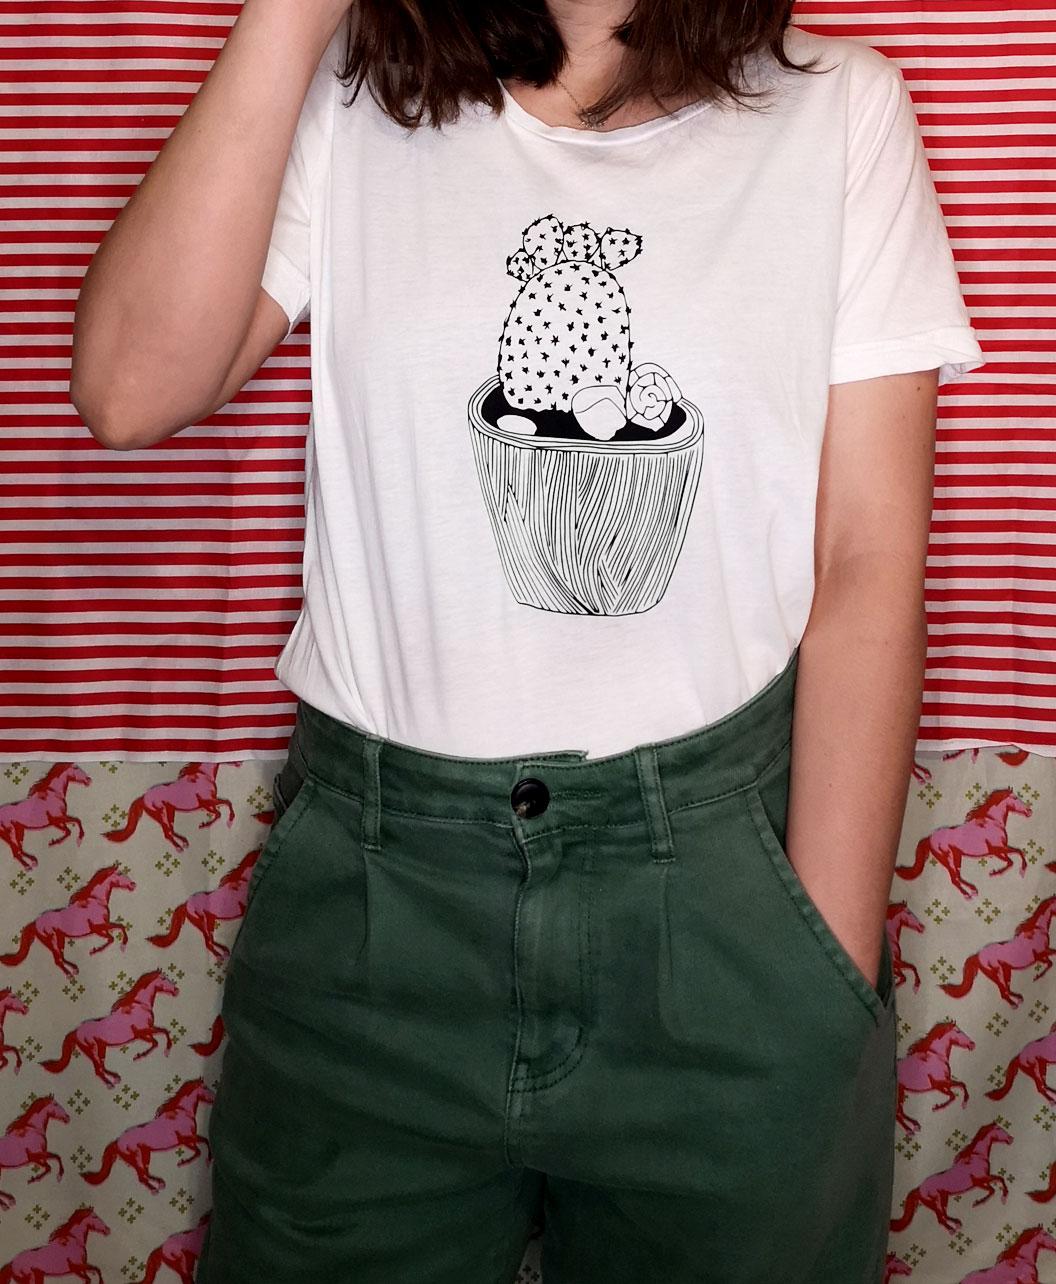 camiseta unisex adulto manga corta blanca muy rebajada ultima unidad original divertida ilustracion cactus sencilla